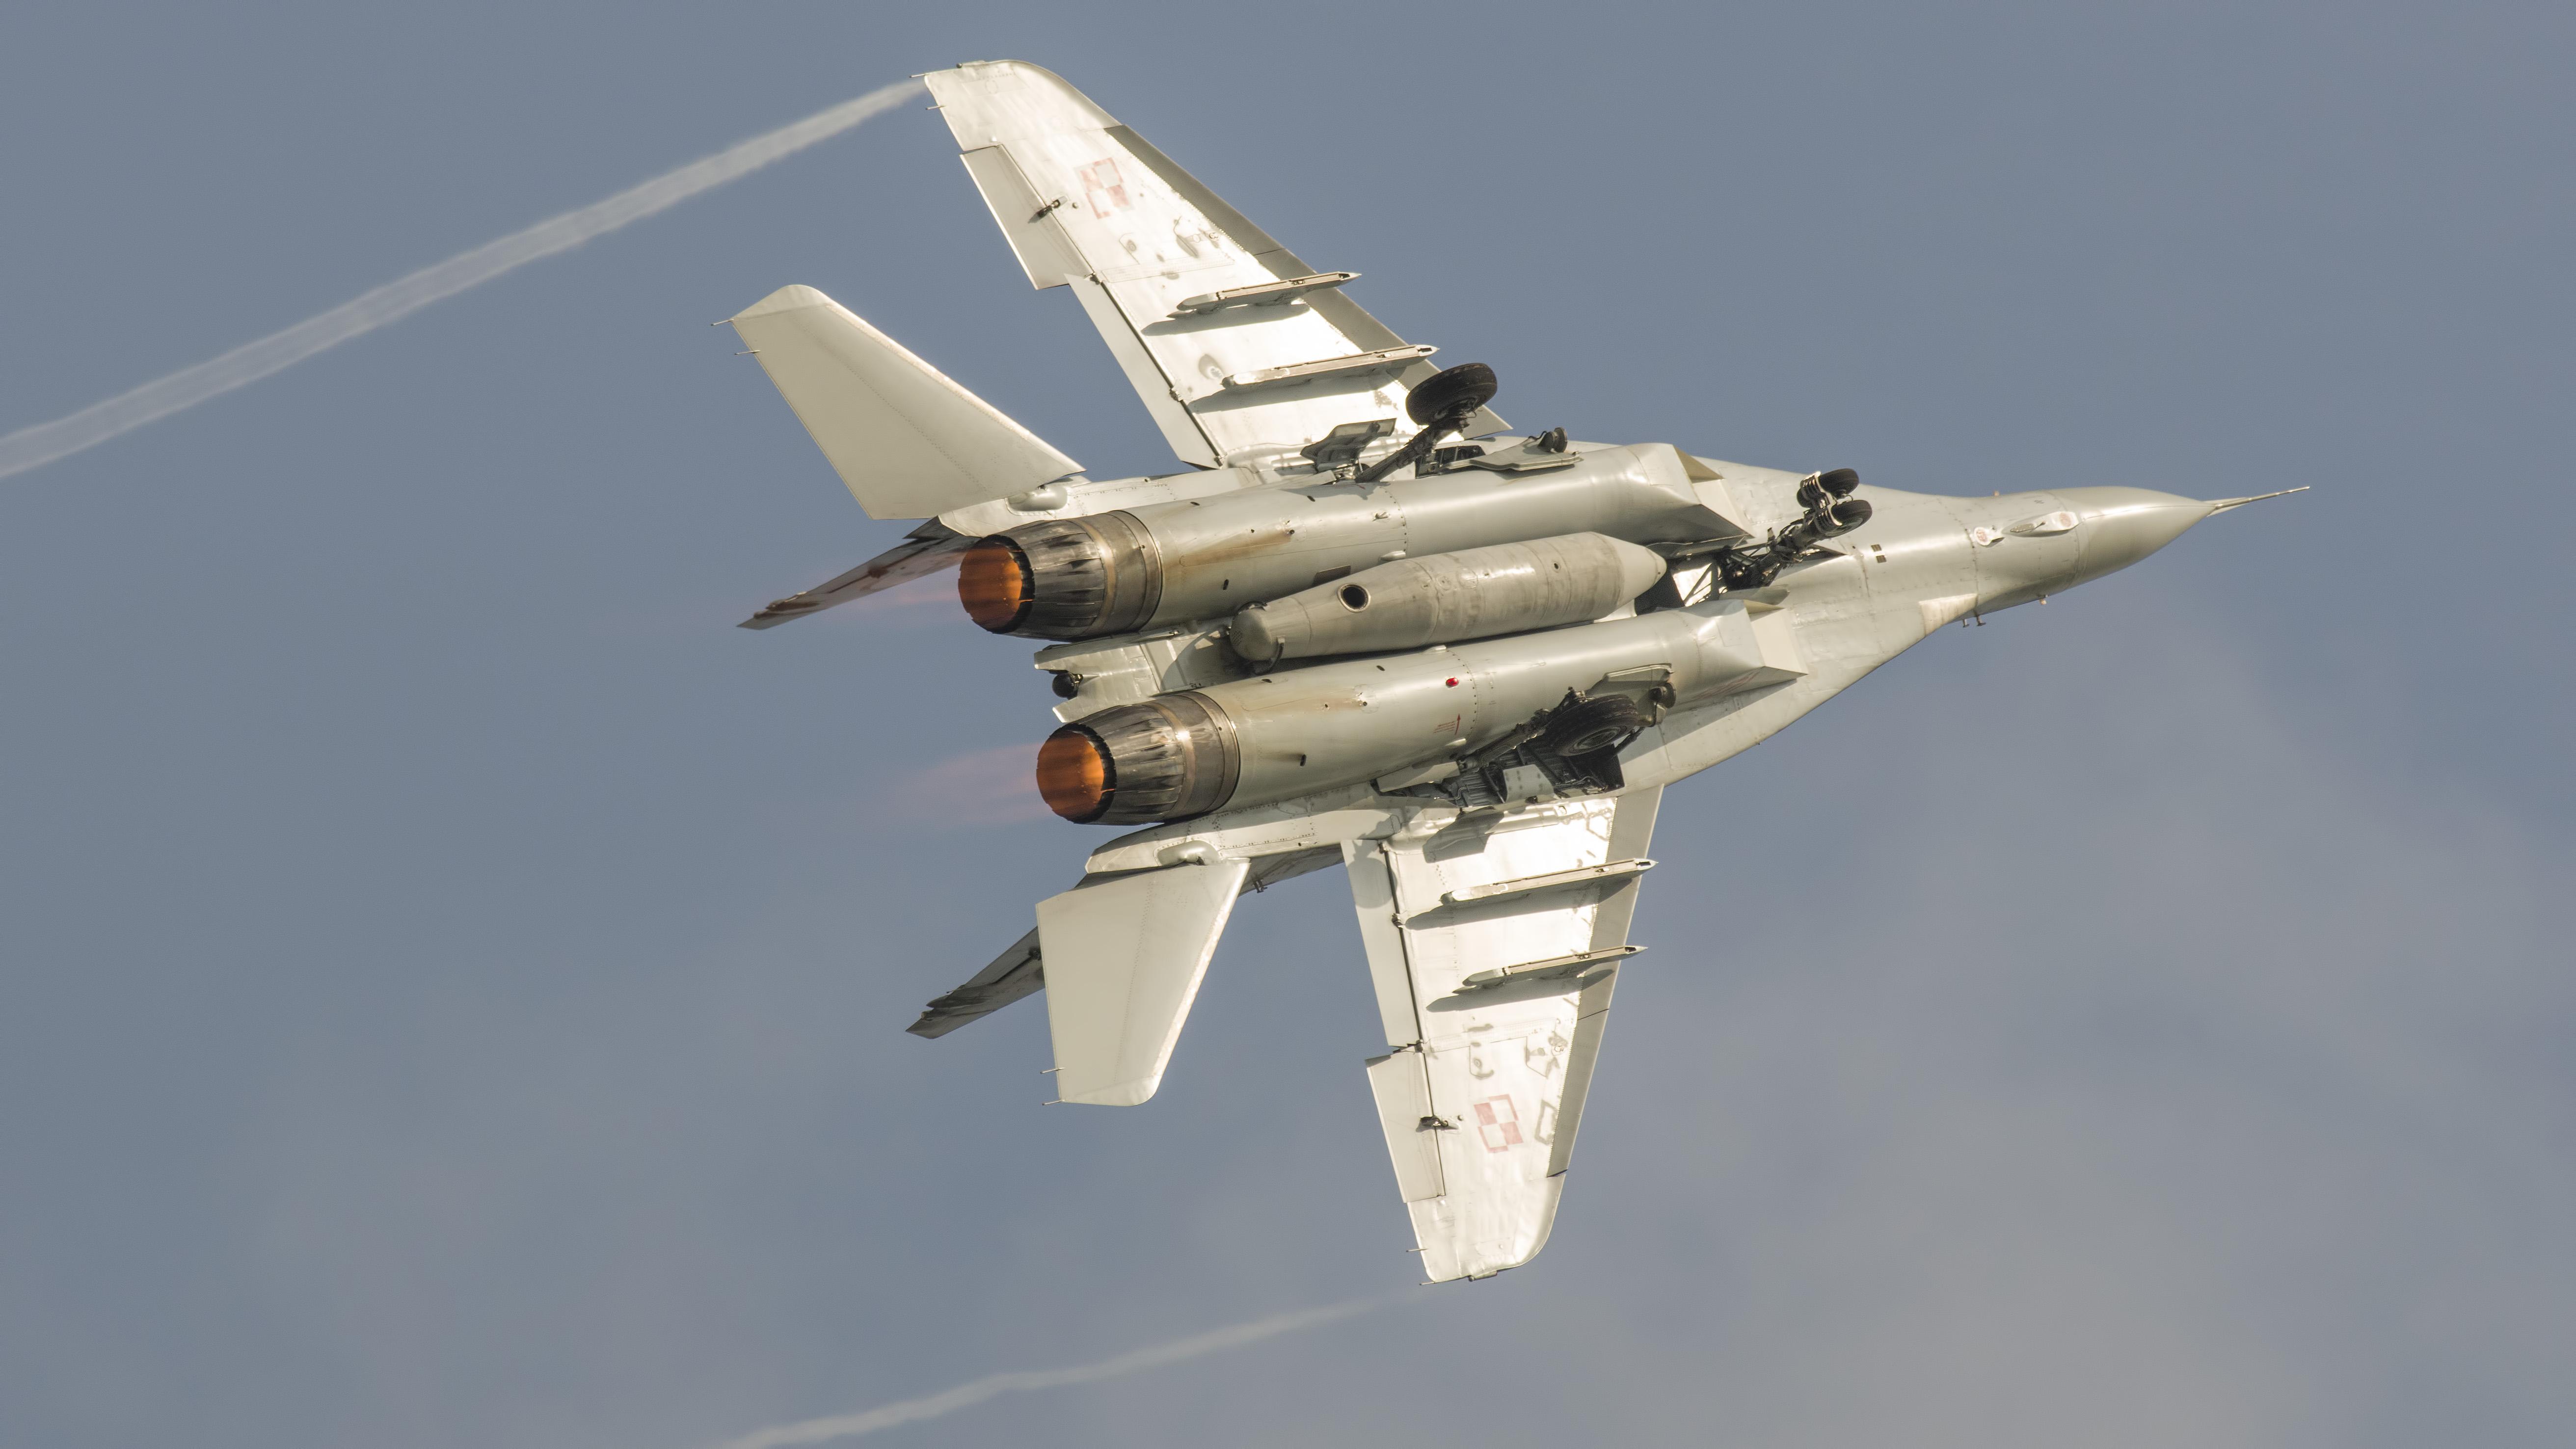 _IMG2100 Mikoyan-Gurevich MiG-29A 9-12A 105 Polish Air Force